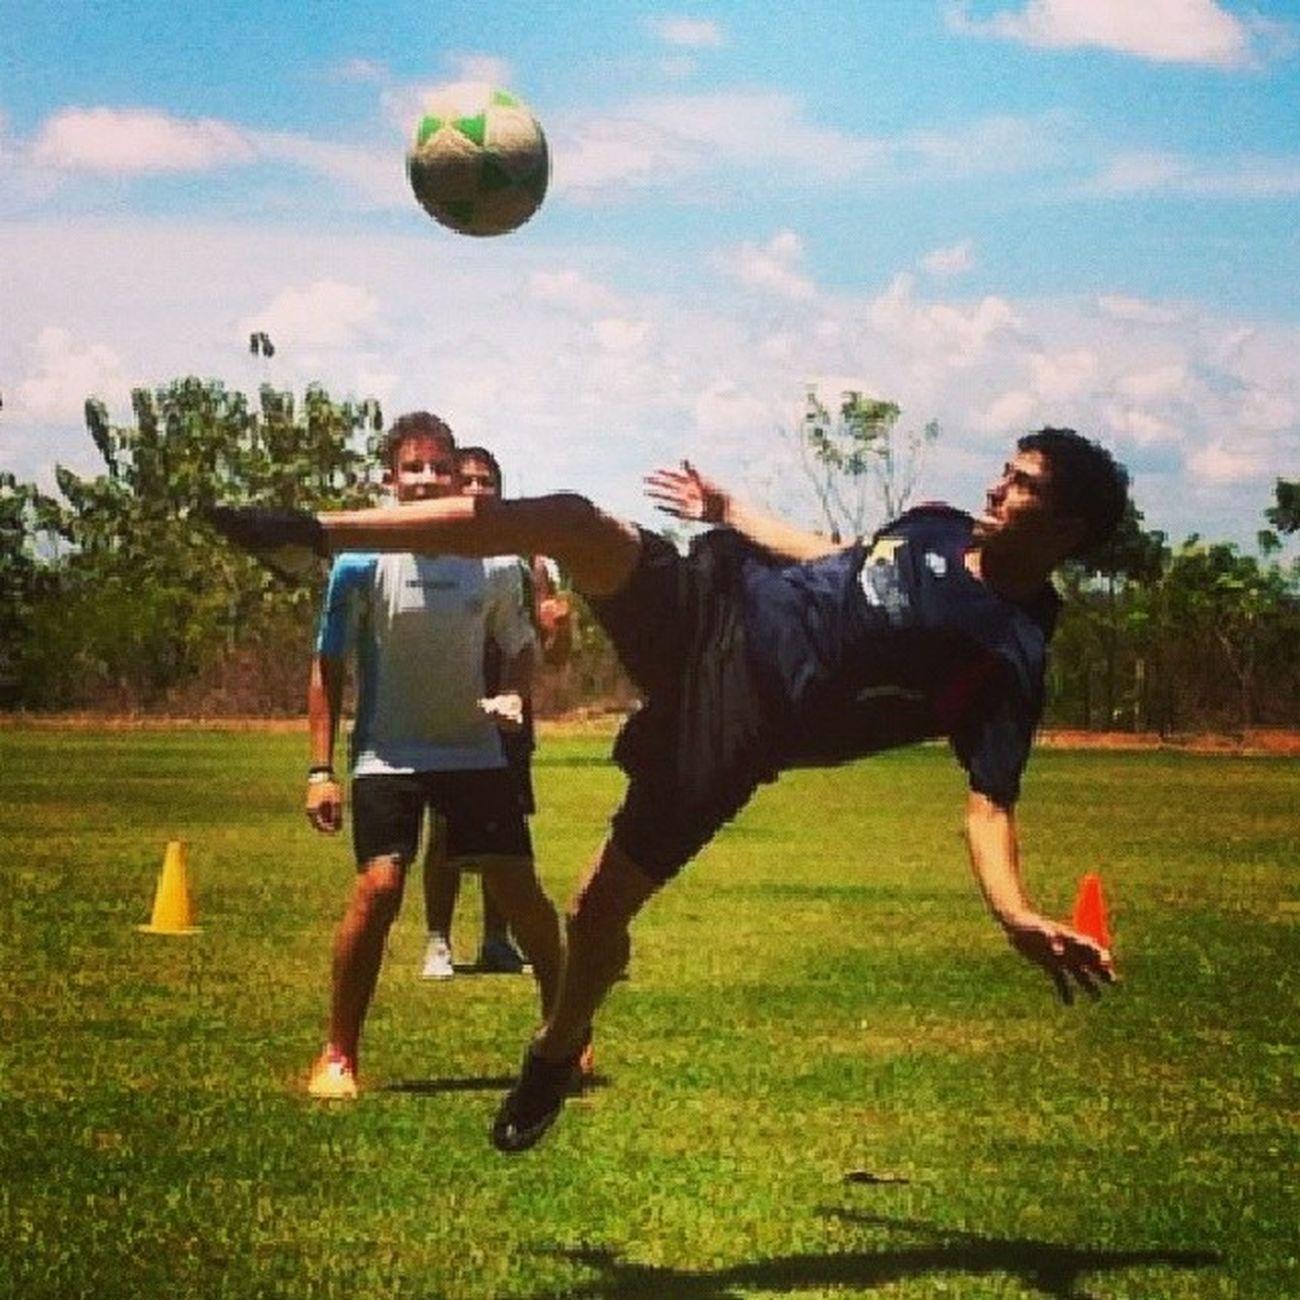 Me Football Chilena Footballtennis Trainingg